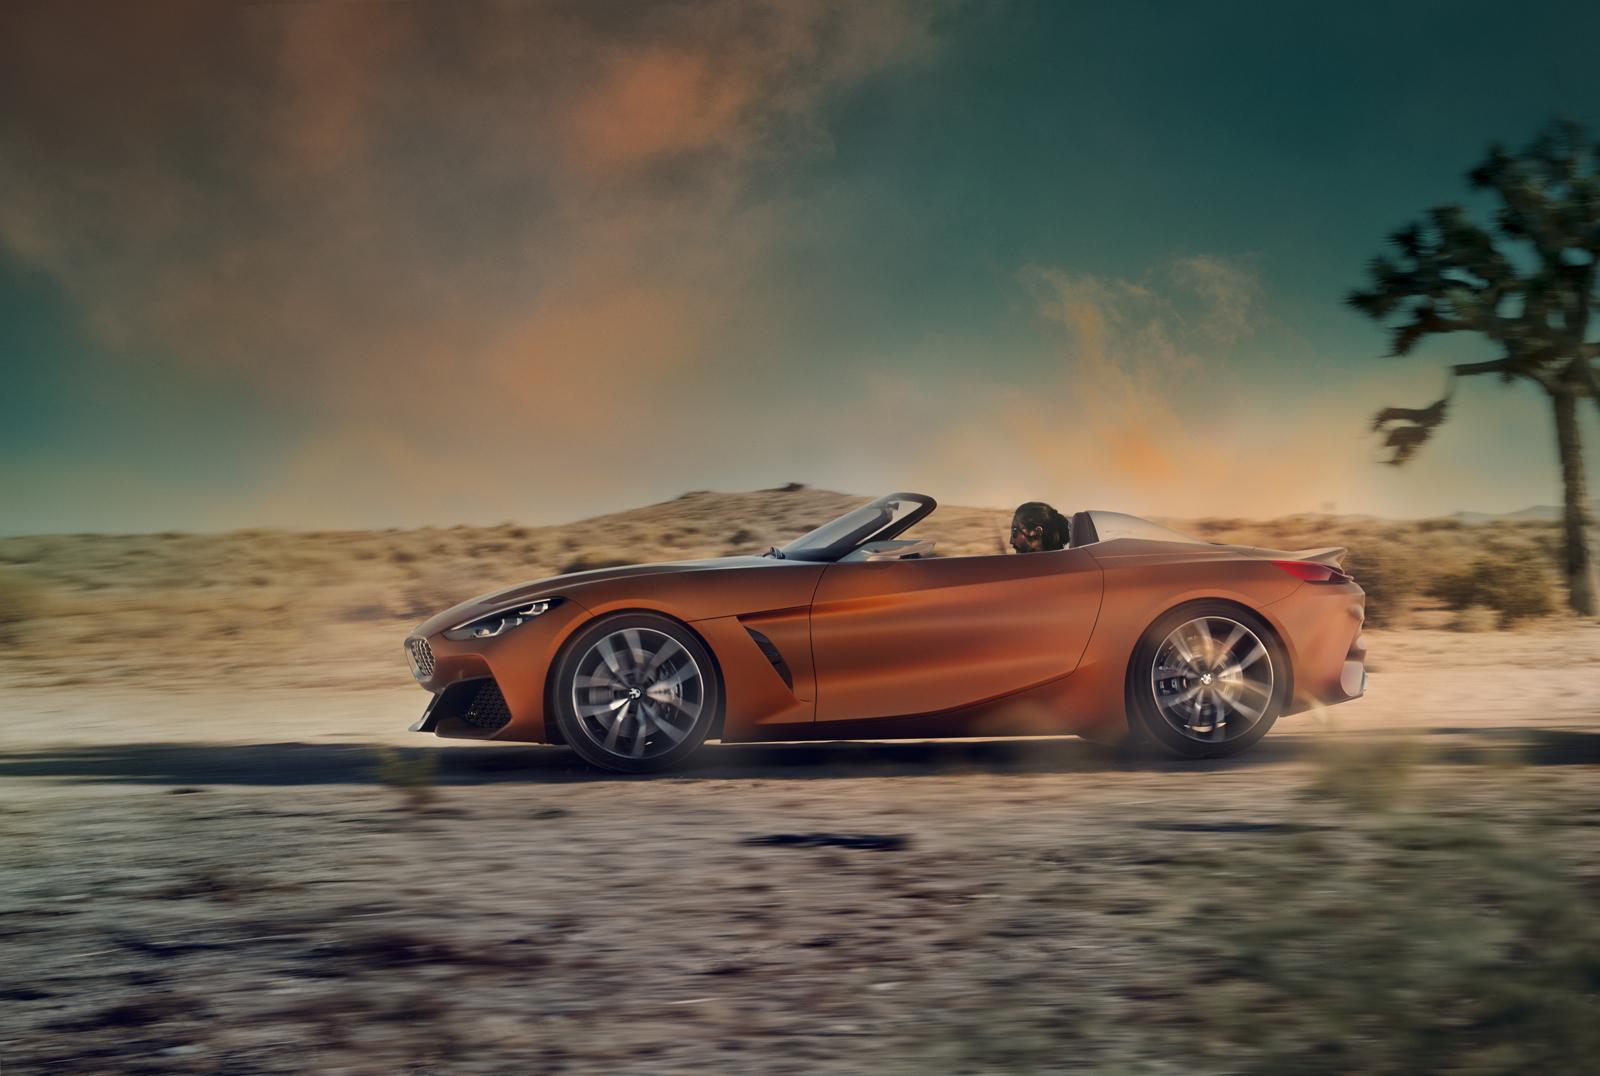 BMW_DCC070_20.jpg